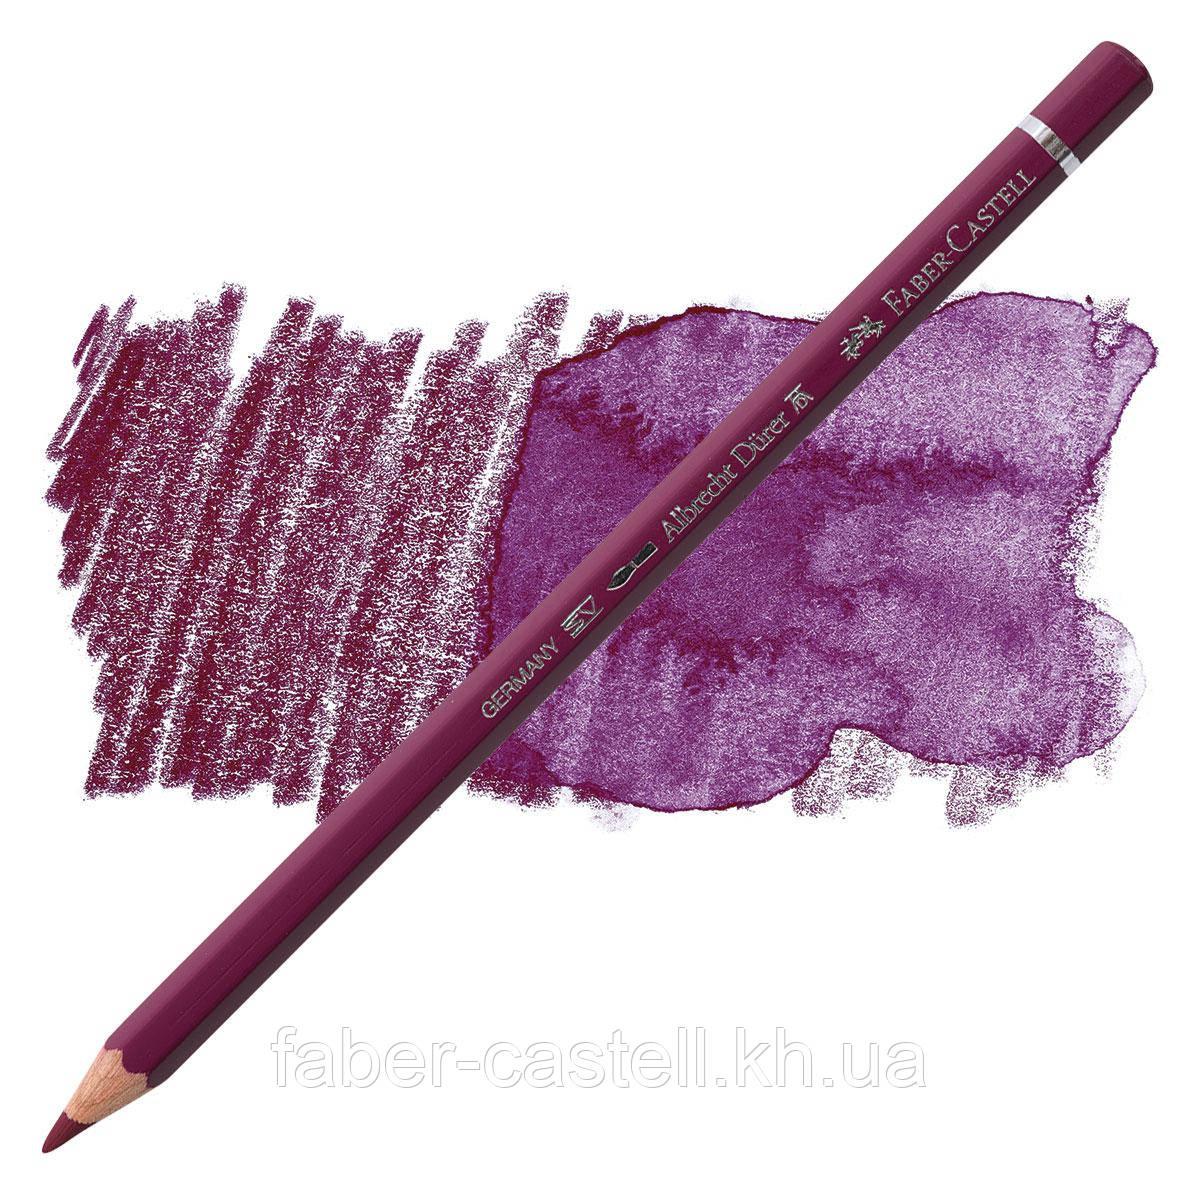 Олівець акварельний кольоровий Faber-Castell Albrecht Дюрера пурпурний / магента (Magenta) № 133, 117633